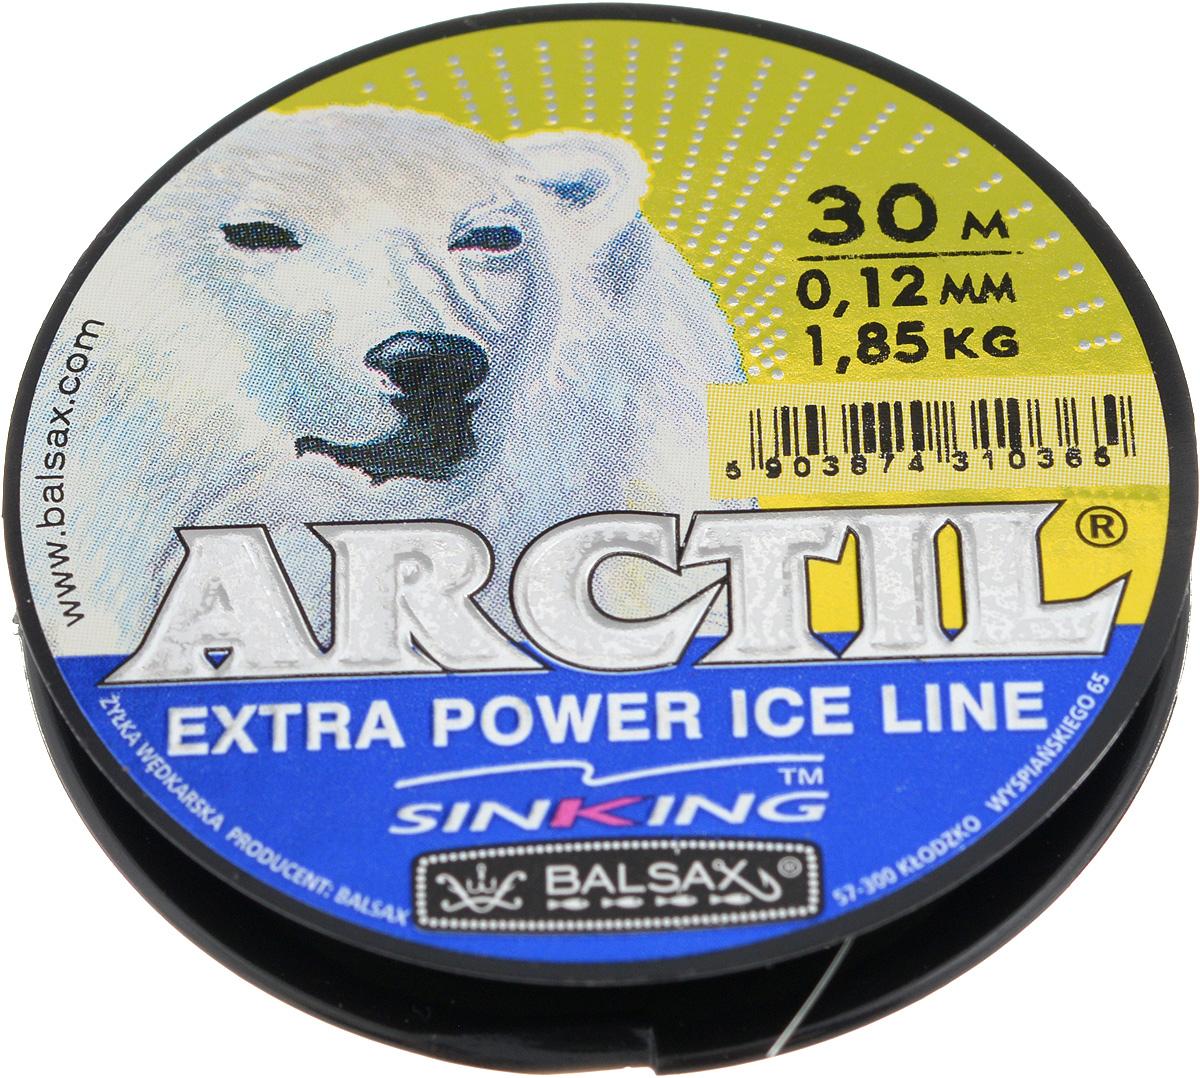 Леска зимняя Balsax Arctil, 30 м, 0,12 мм, 1,85 кг